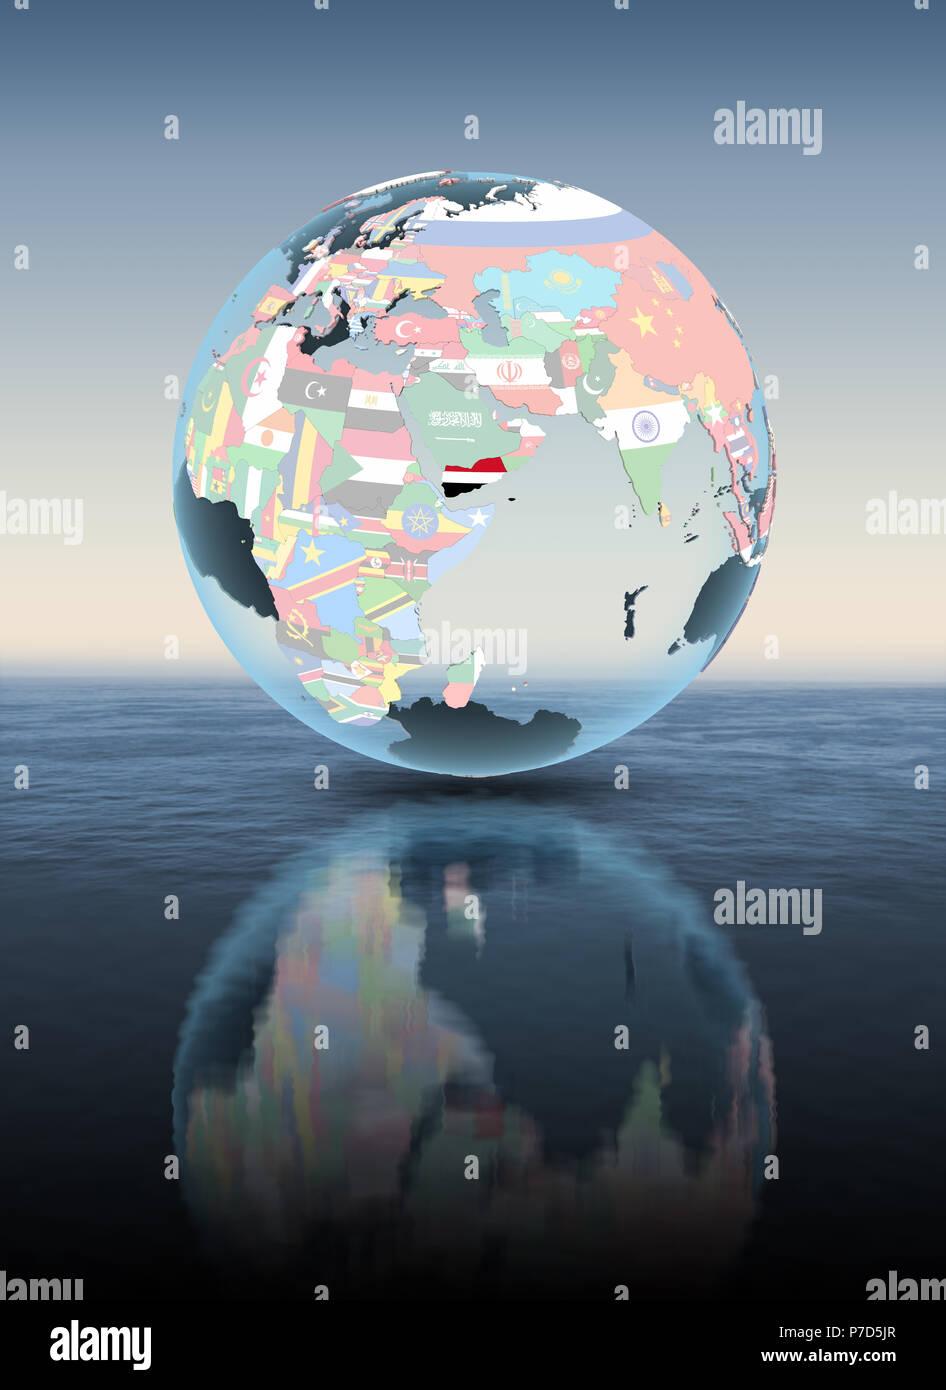 Yemen on political globe floating above water. 3D illustration. - Stock Image